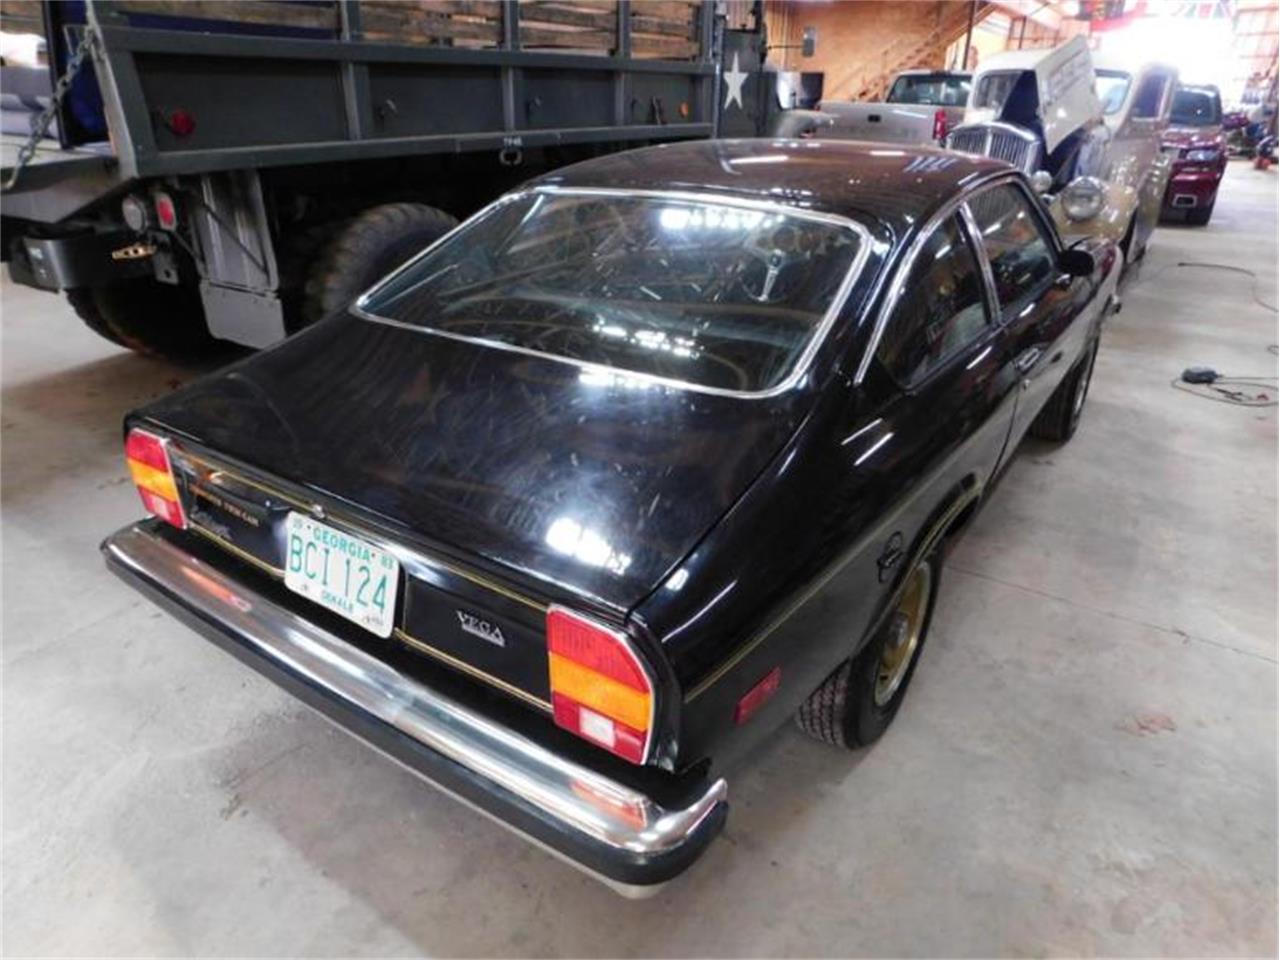 1976 Chevrolet Vega (CC-1229674) for sale in Suwanee, Georgia